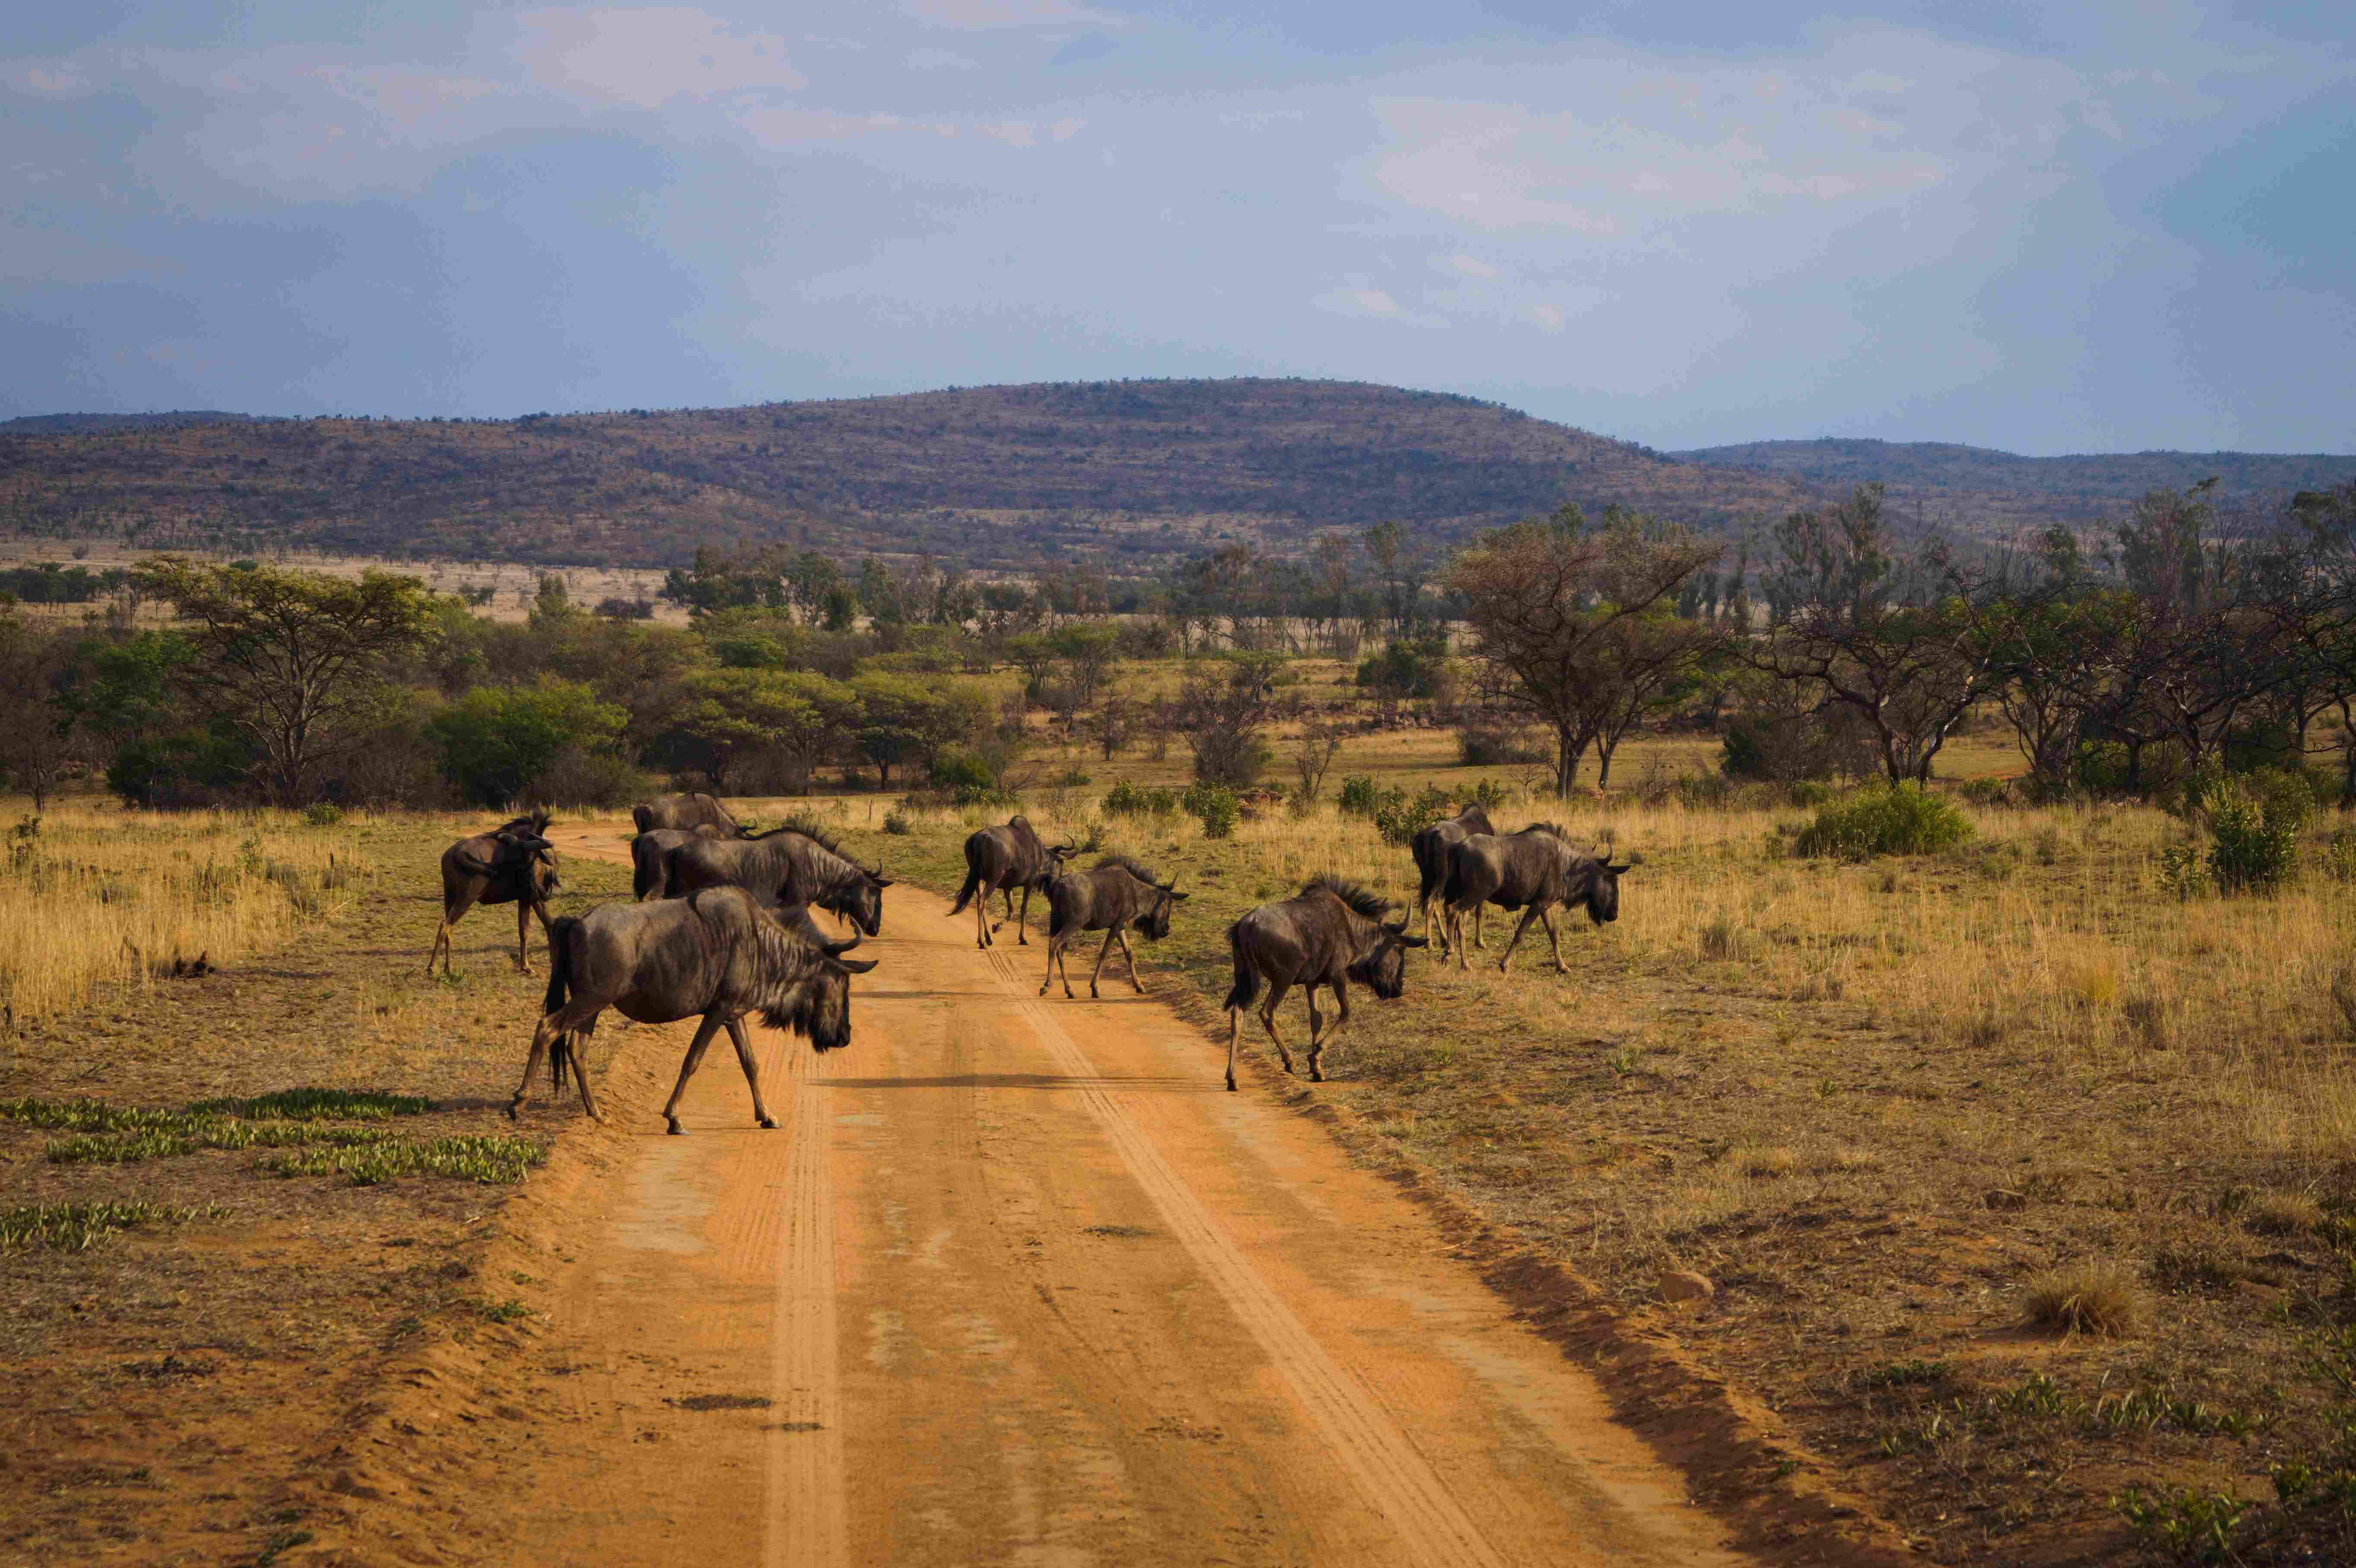 South Africa. Image by Jura Bakx on Unsplash